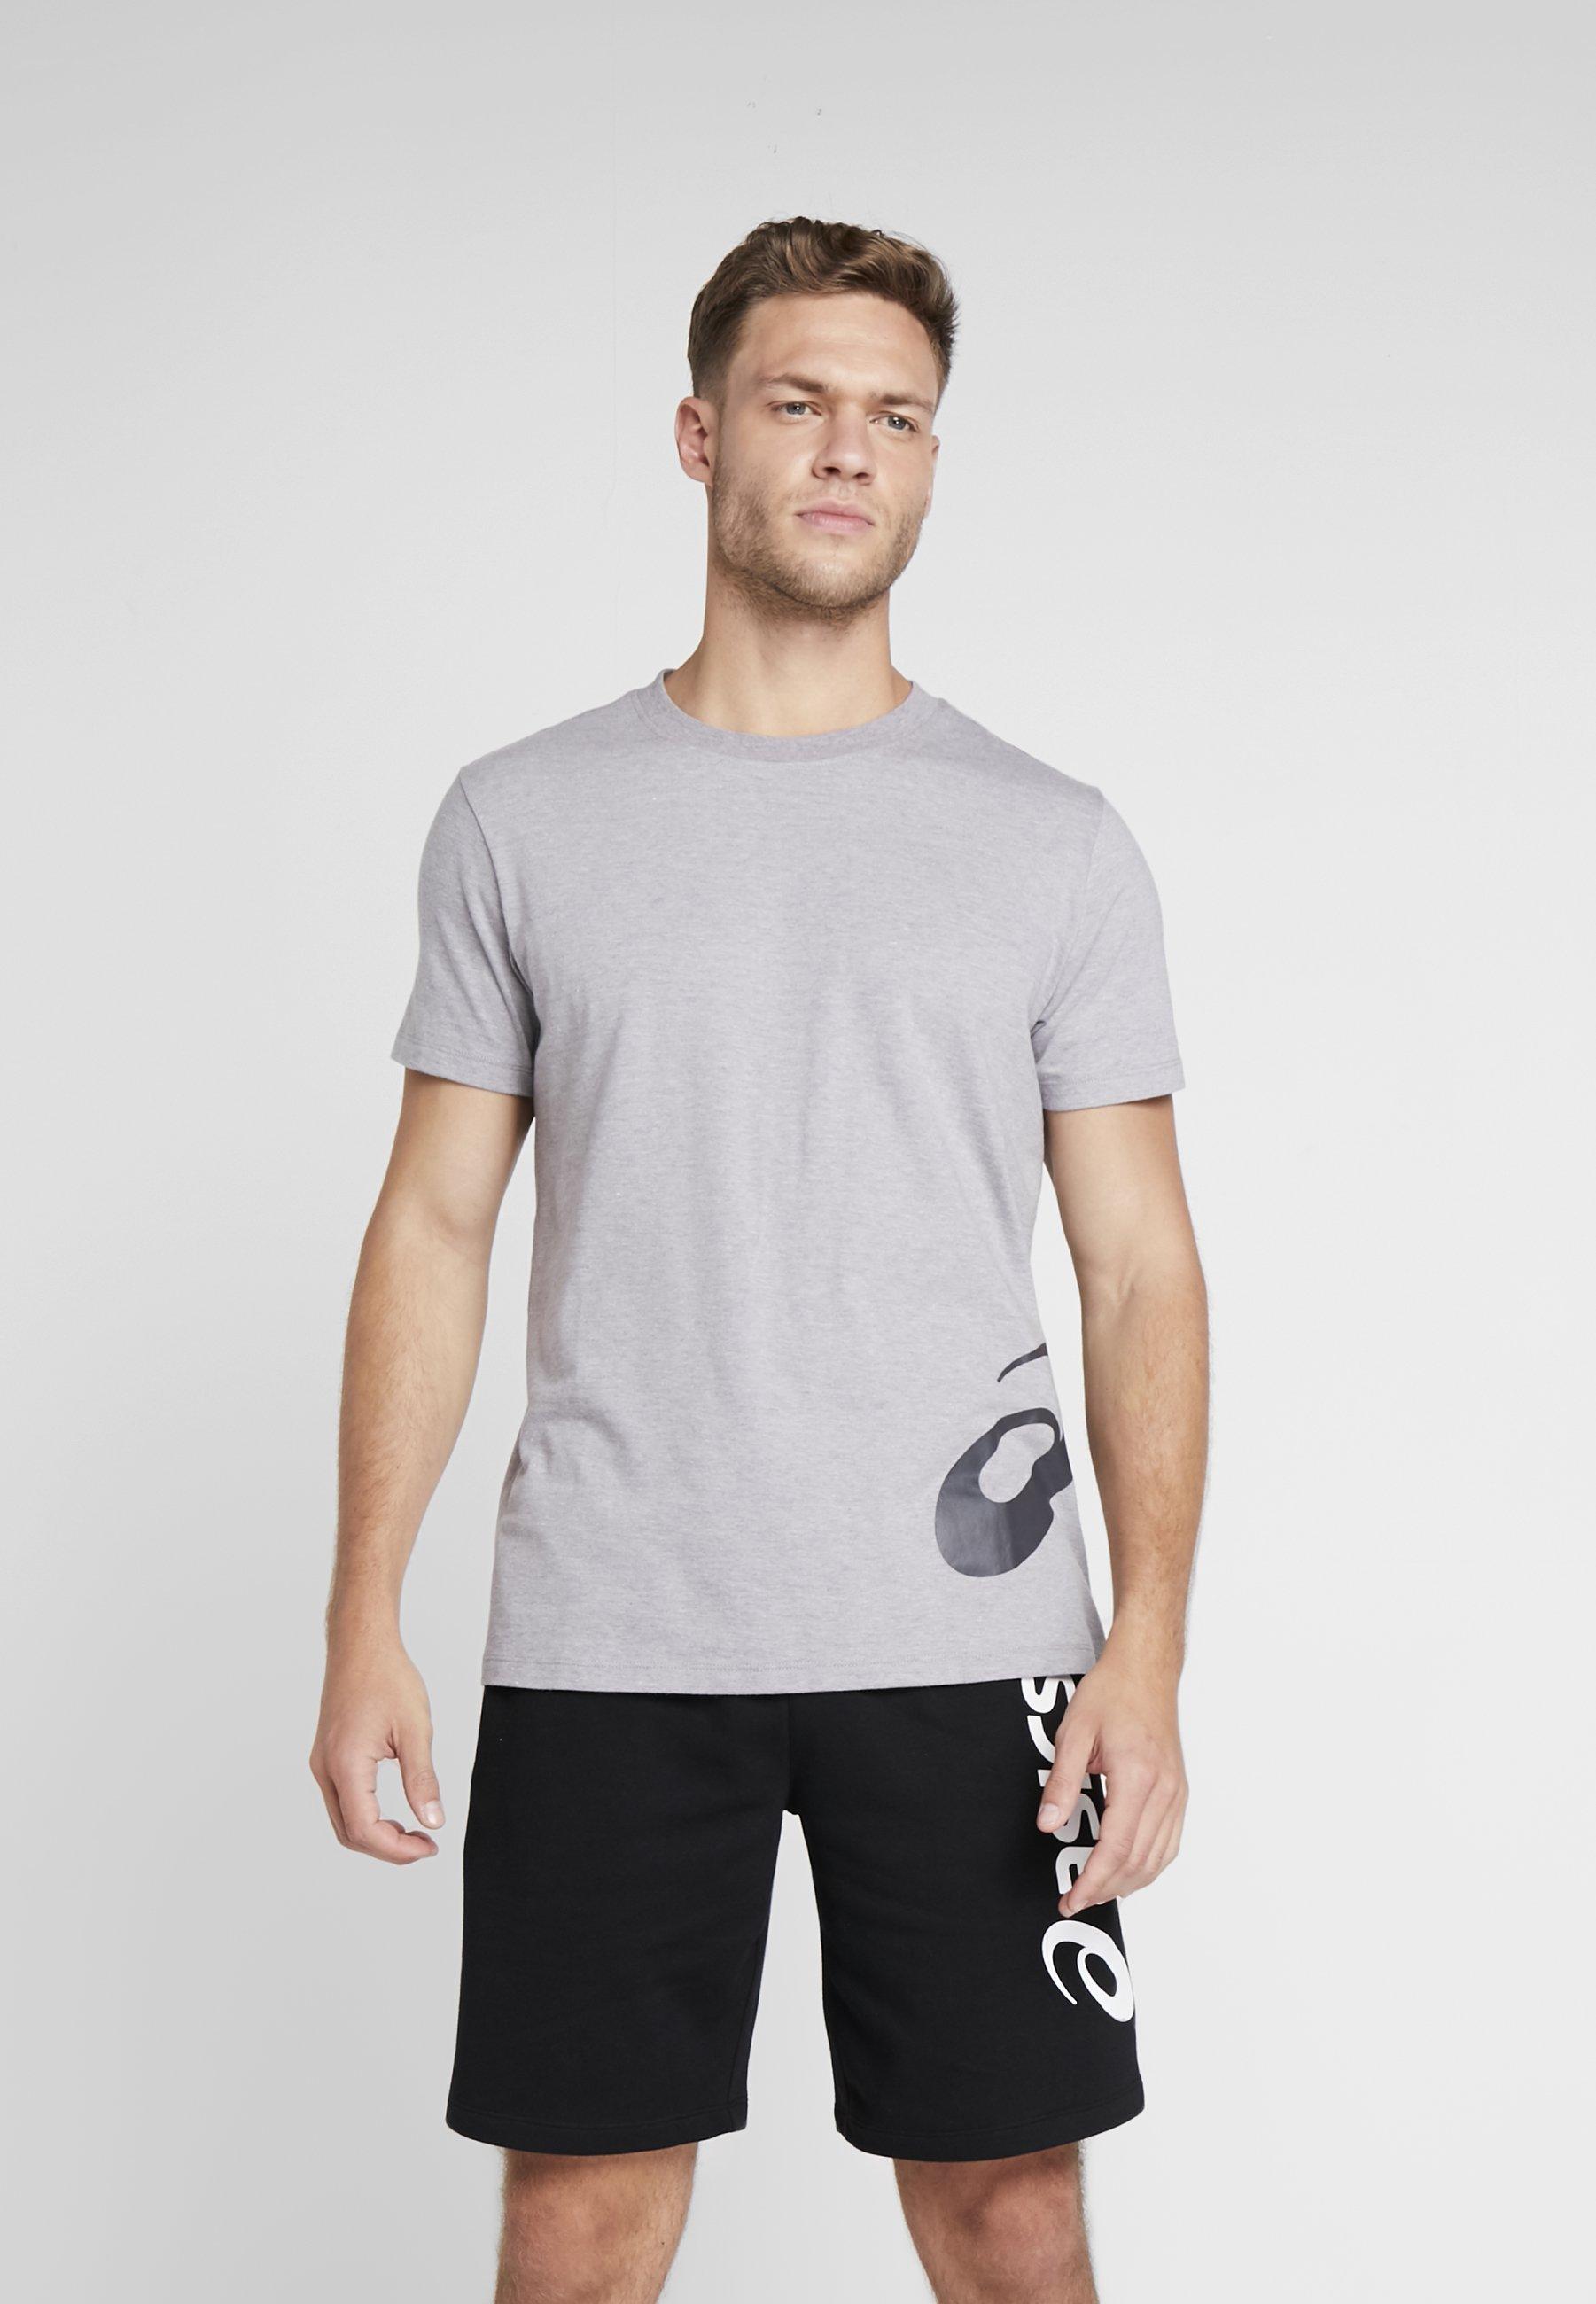 TeeT dark Heather Grey Big Logo Asics shirt Imprimé Low Mid qzSMVUp